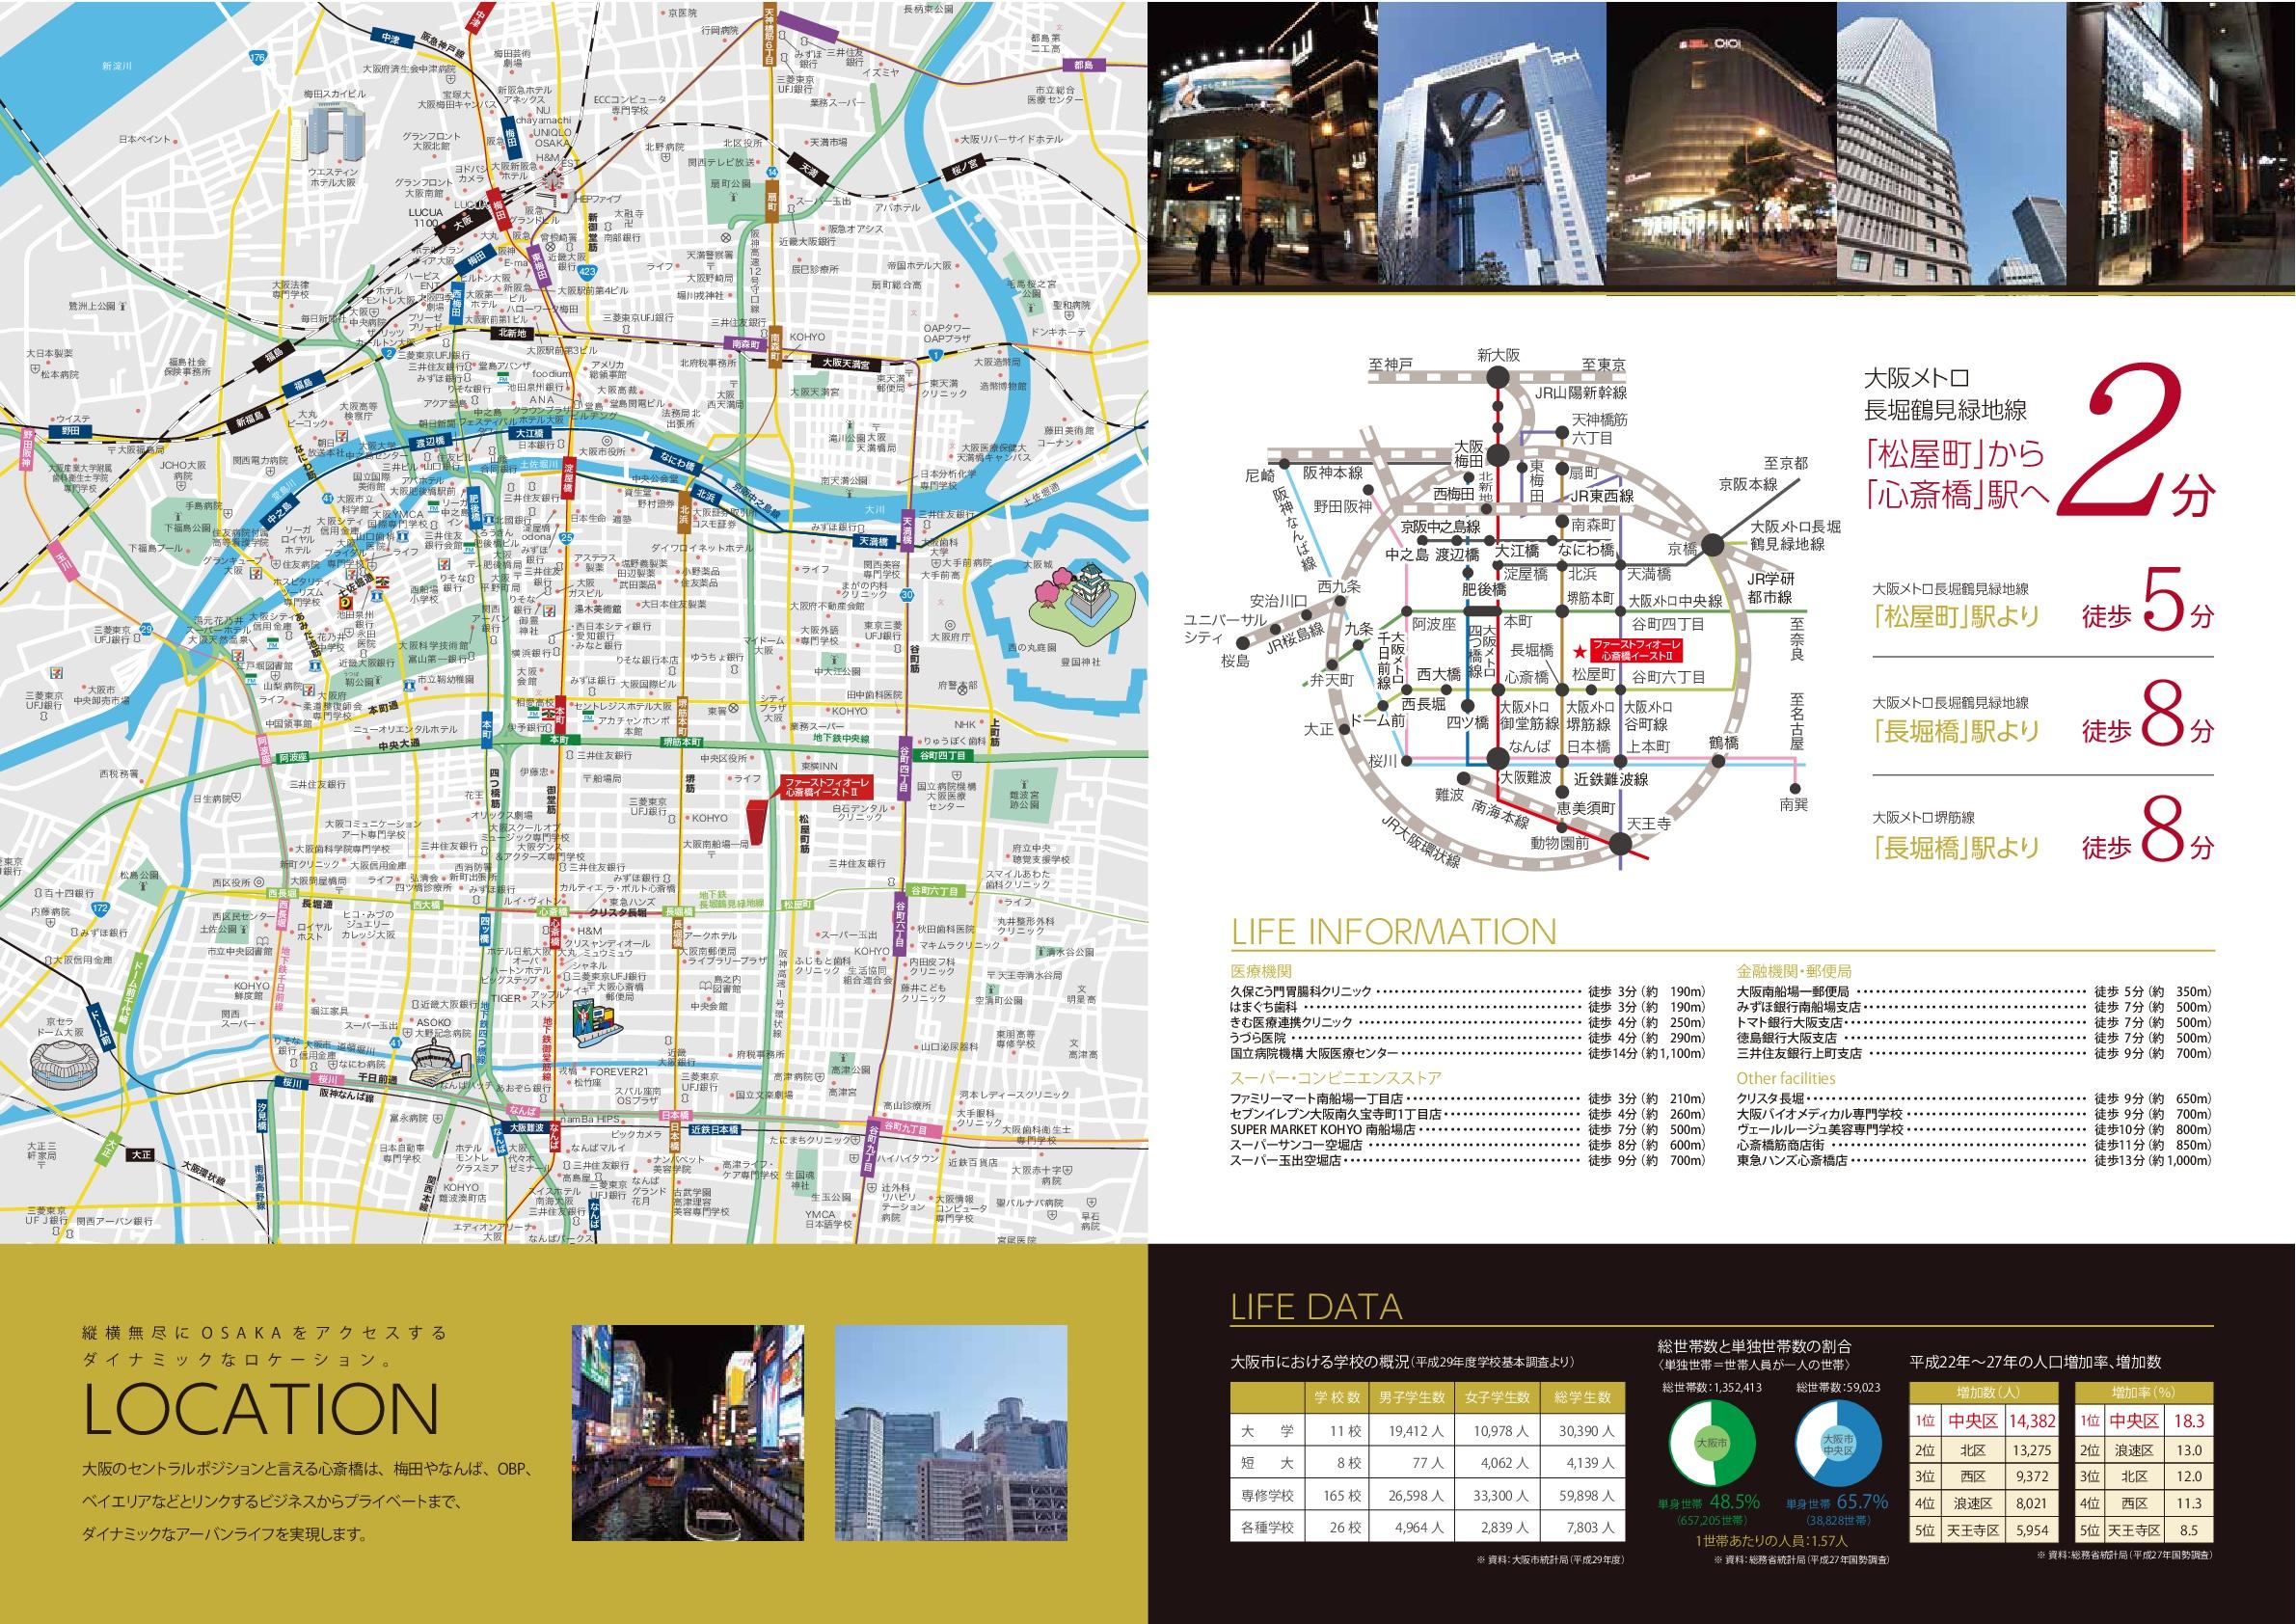 http://goldfastate.com/asapri/wp-content/uploads/2018/02/first-fiore-shinsaibashi-east2-loc.jpg